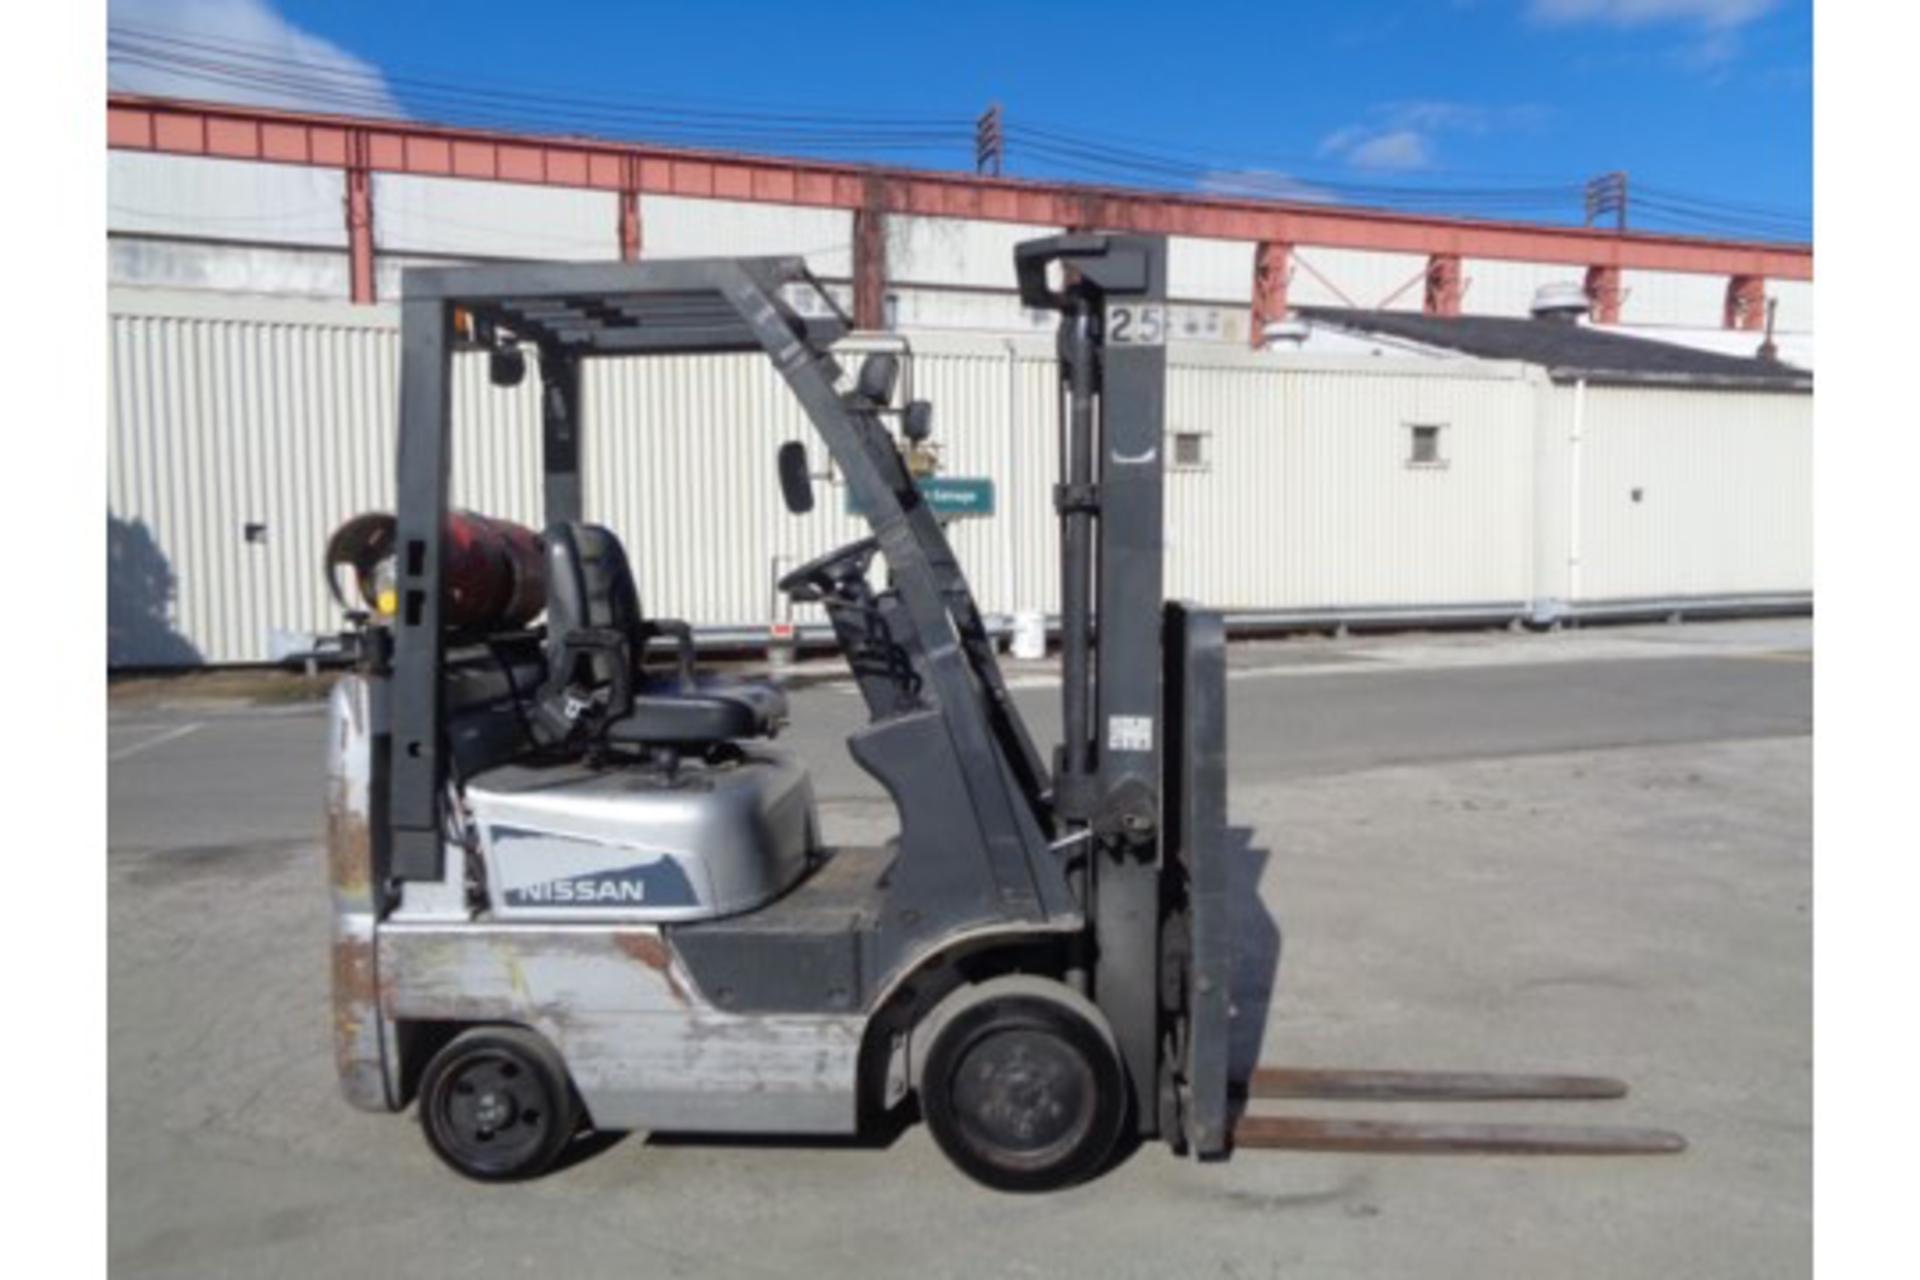 Nissan MCPL01A18LV 3500lb Forklift